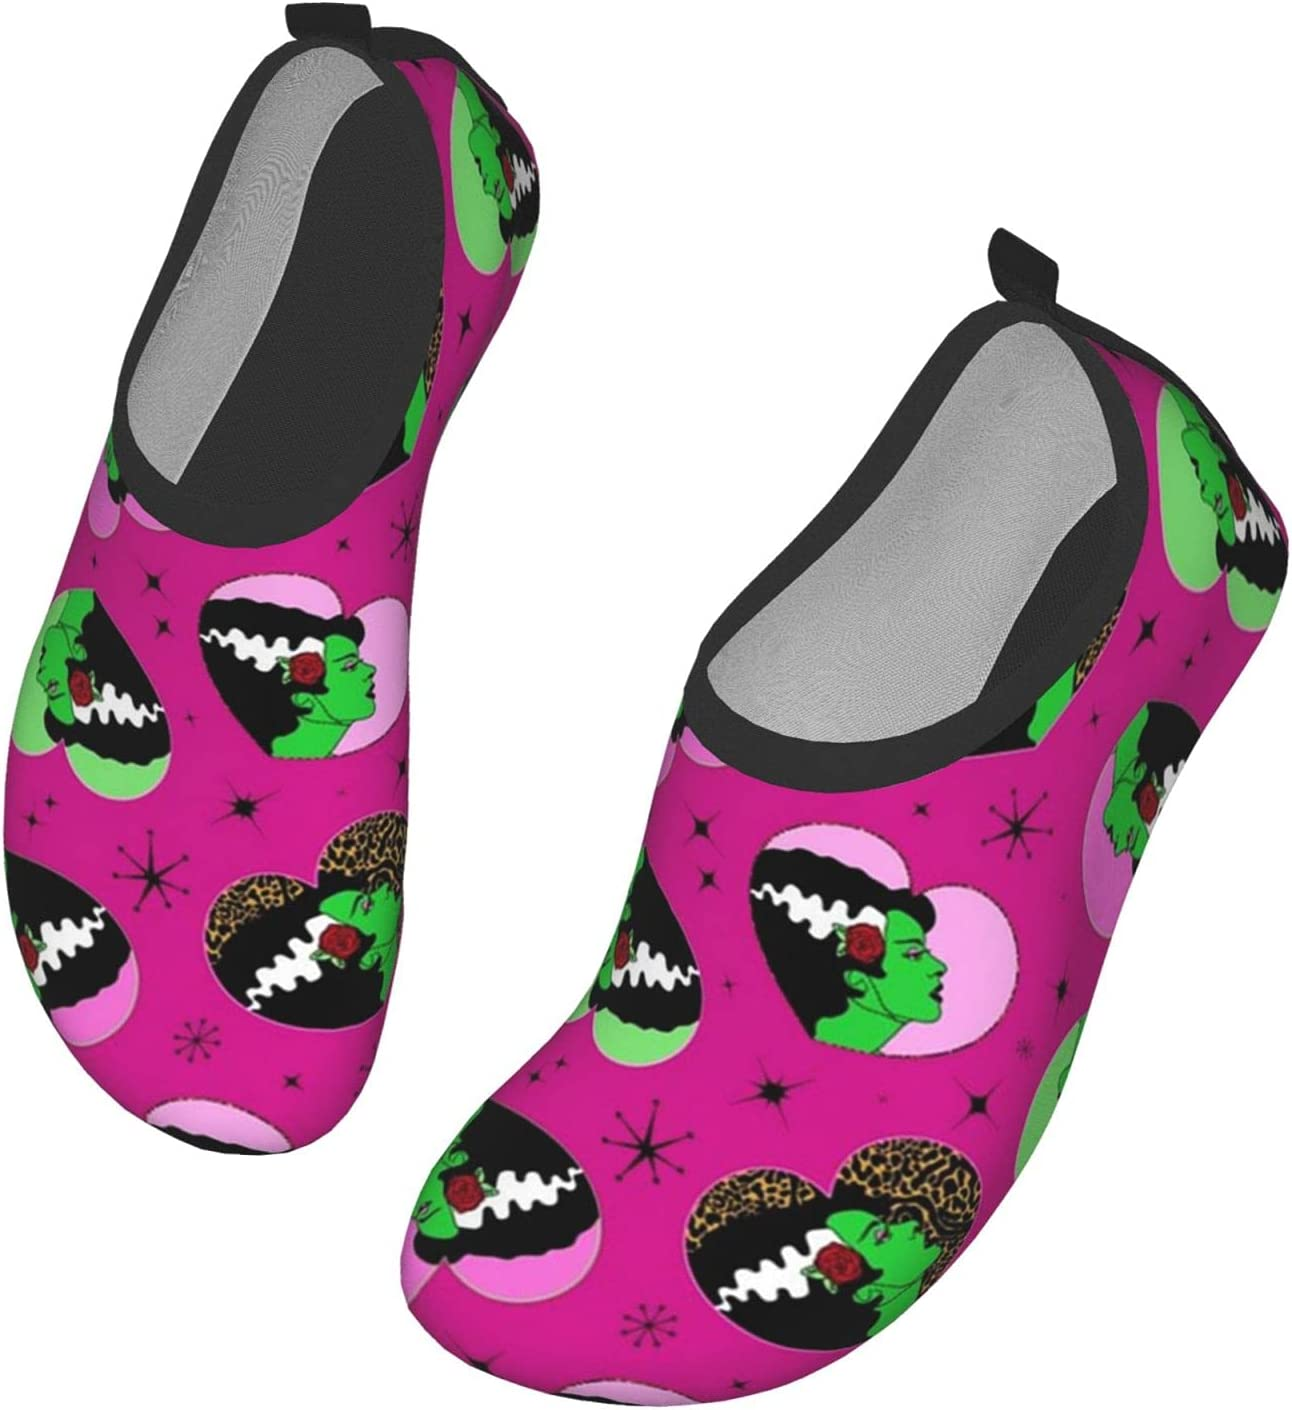 NA Bride Hearts Pink Men's Women's Water Shoes Barefoot Quick Dry Slip-On Aqua Socks for Yoga Beach Sports Swim Surf